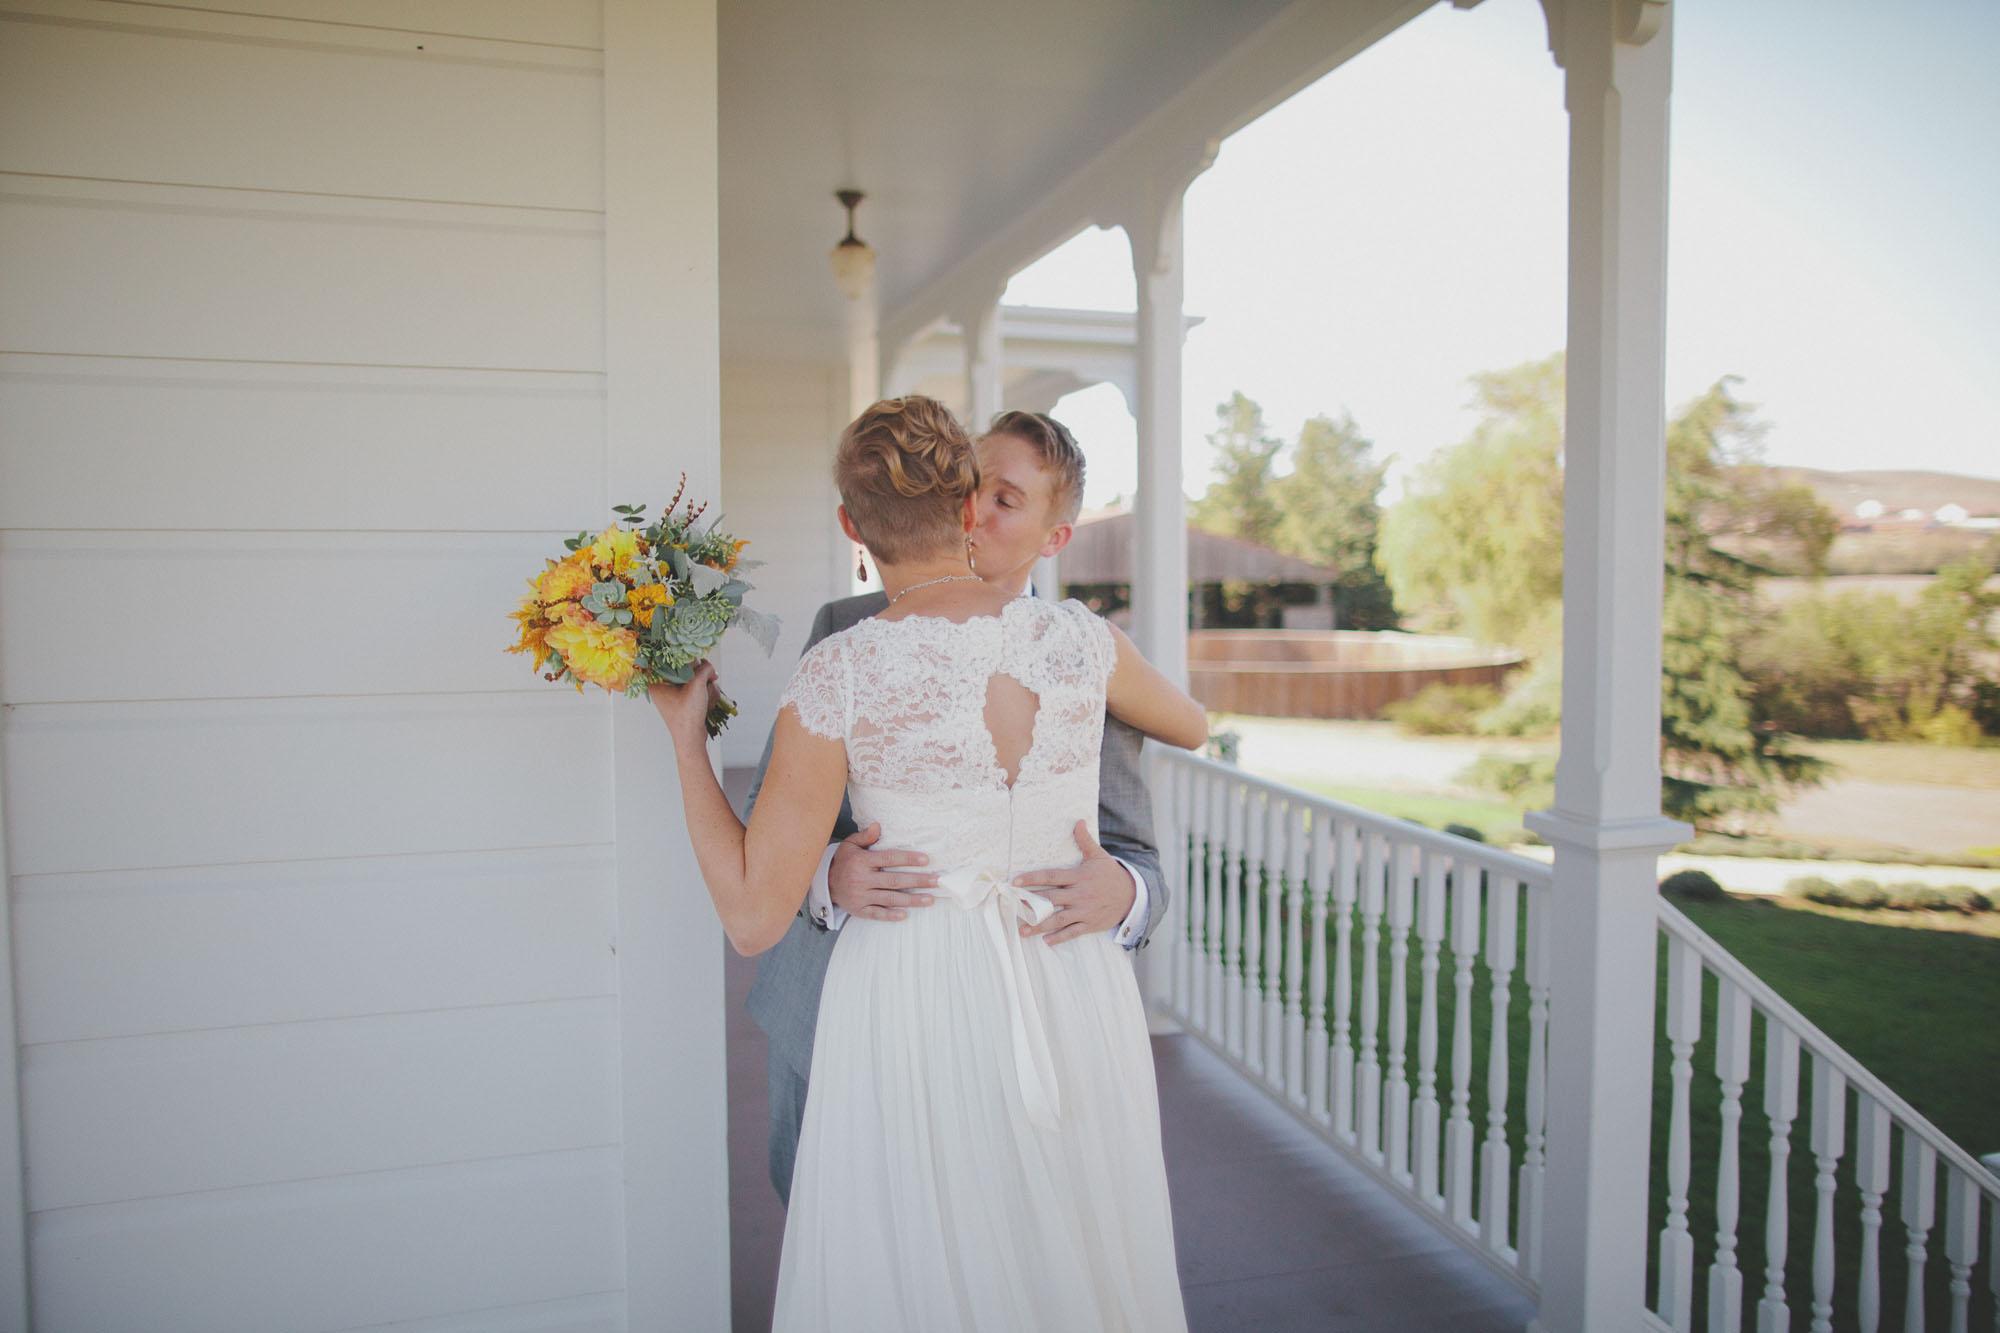 Gretchen_Gause_Petaluma_Olympias_Valley_Wedding_Photo-091.jpg